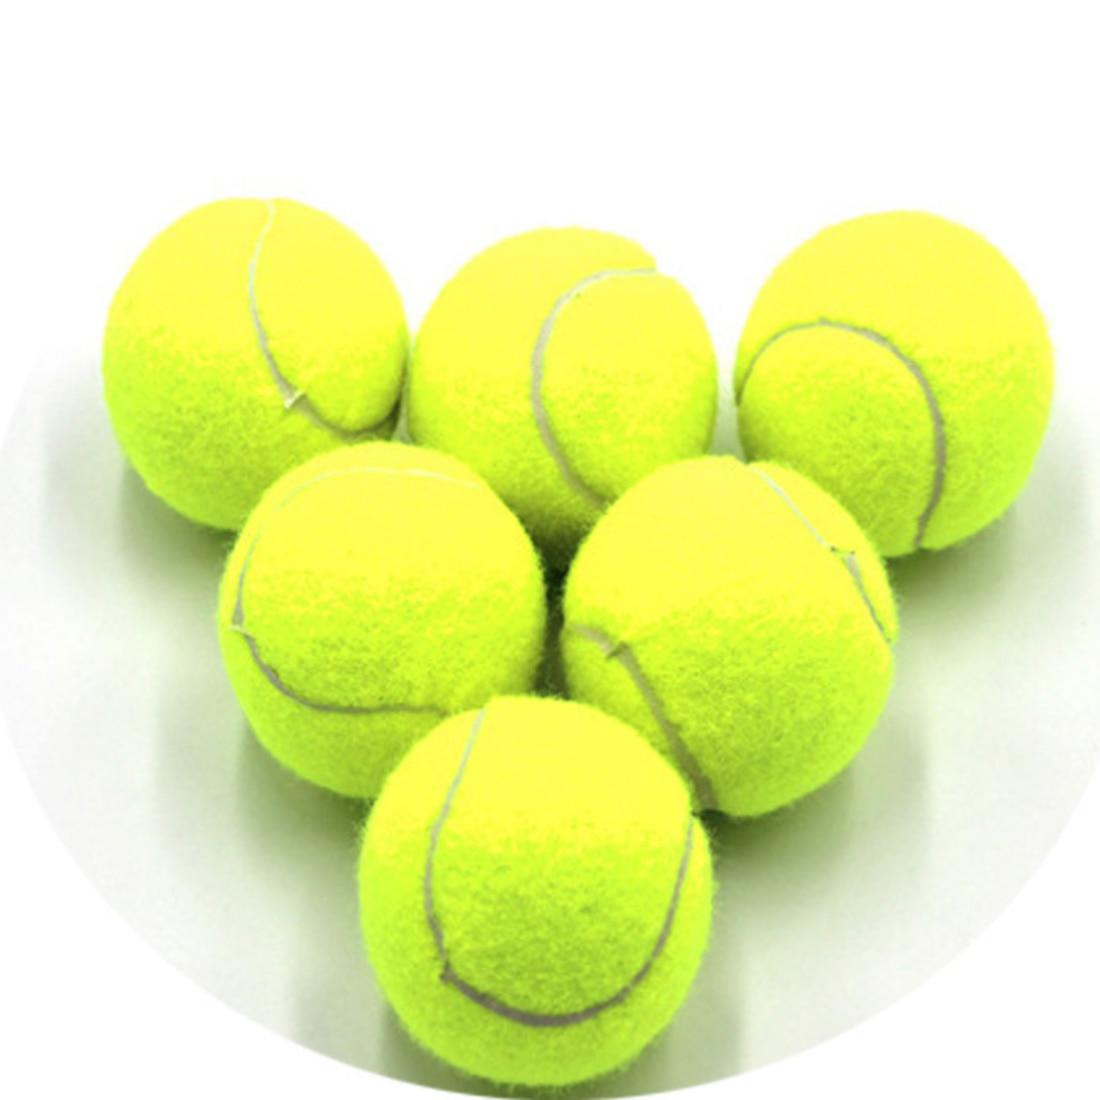 3Pcs Profession Training Tennis Balls Special Offer Durable Tennis Ball Fluorescent Yellow Tenis Masculino